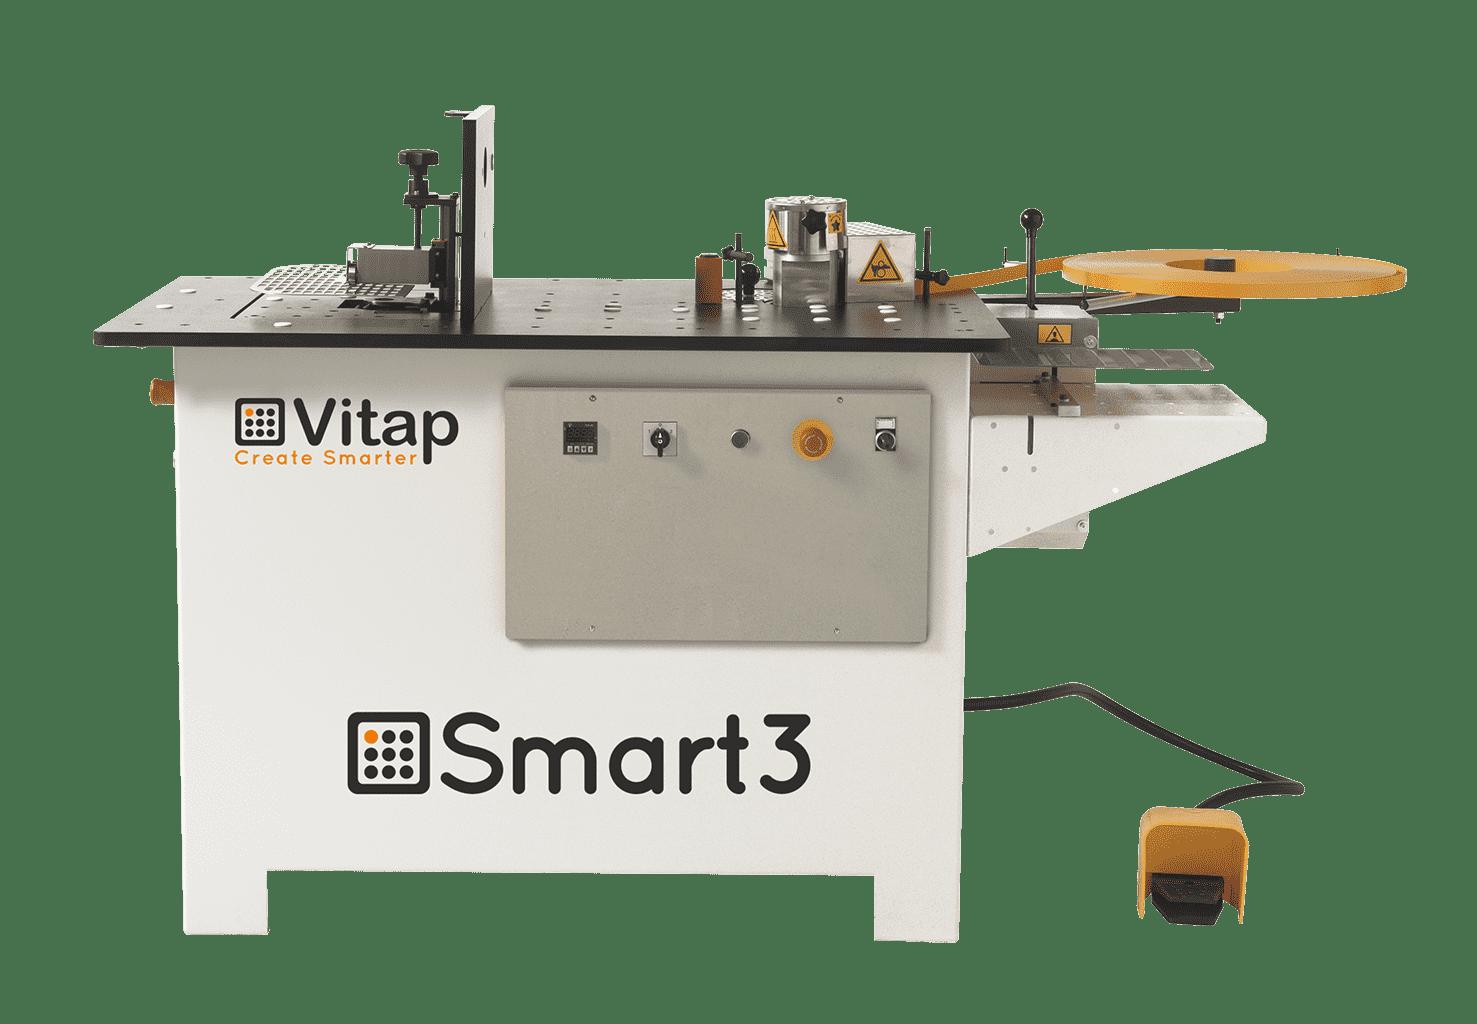 Vitap - Smart3